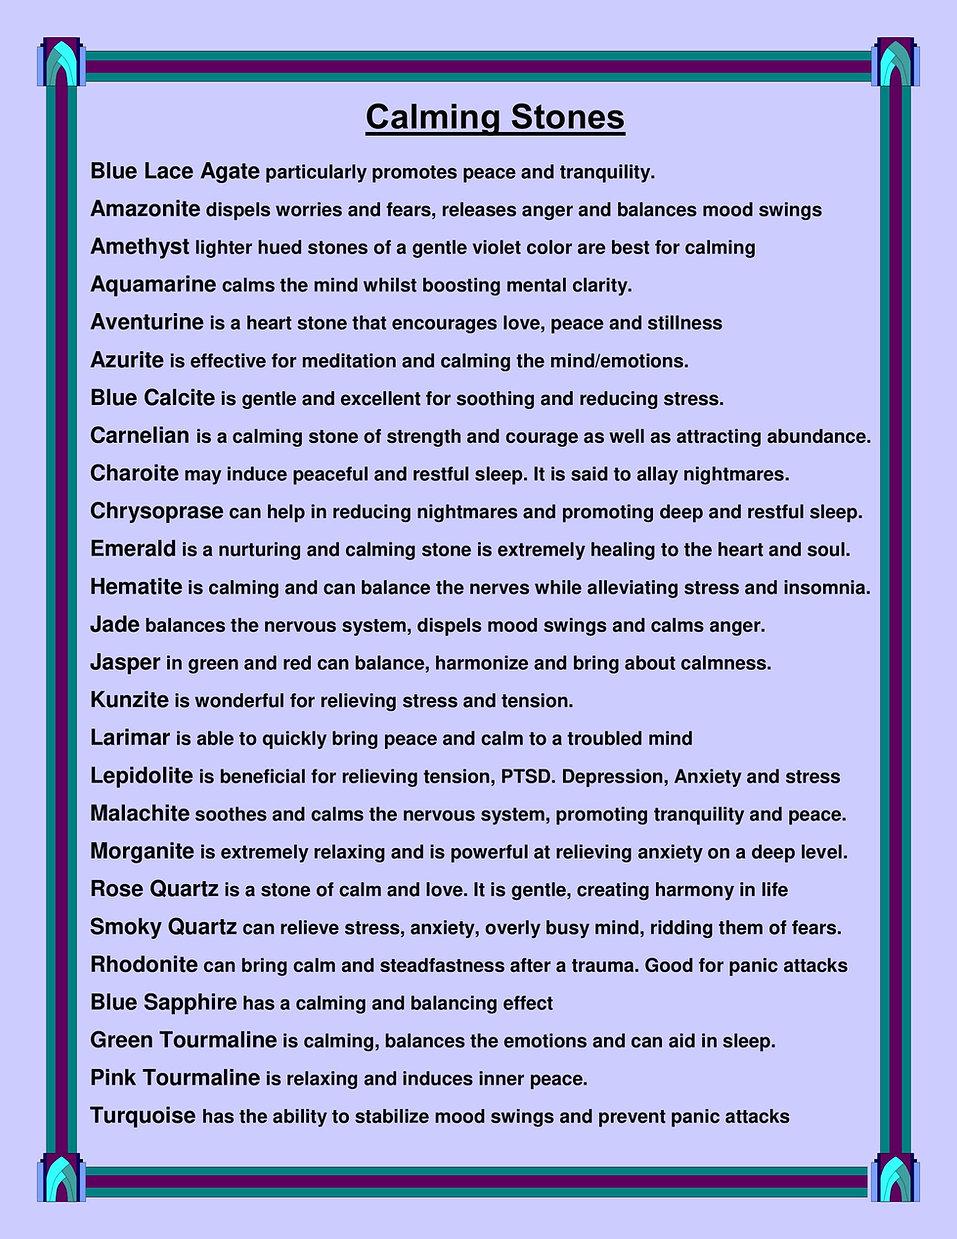 calming stones 1 page-1.jpg